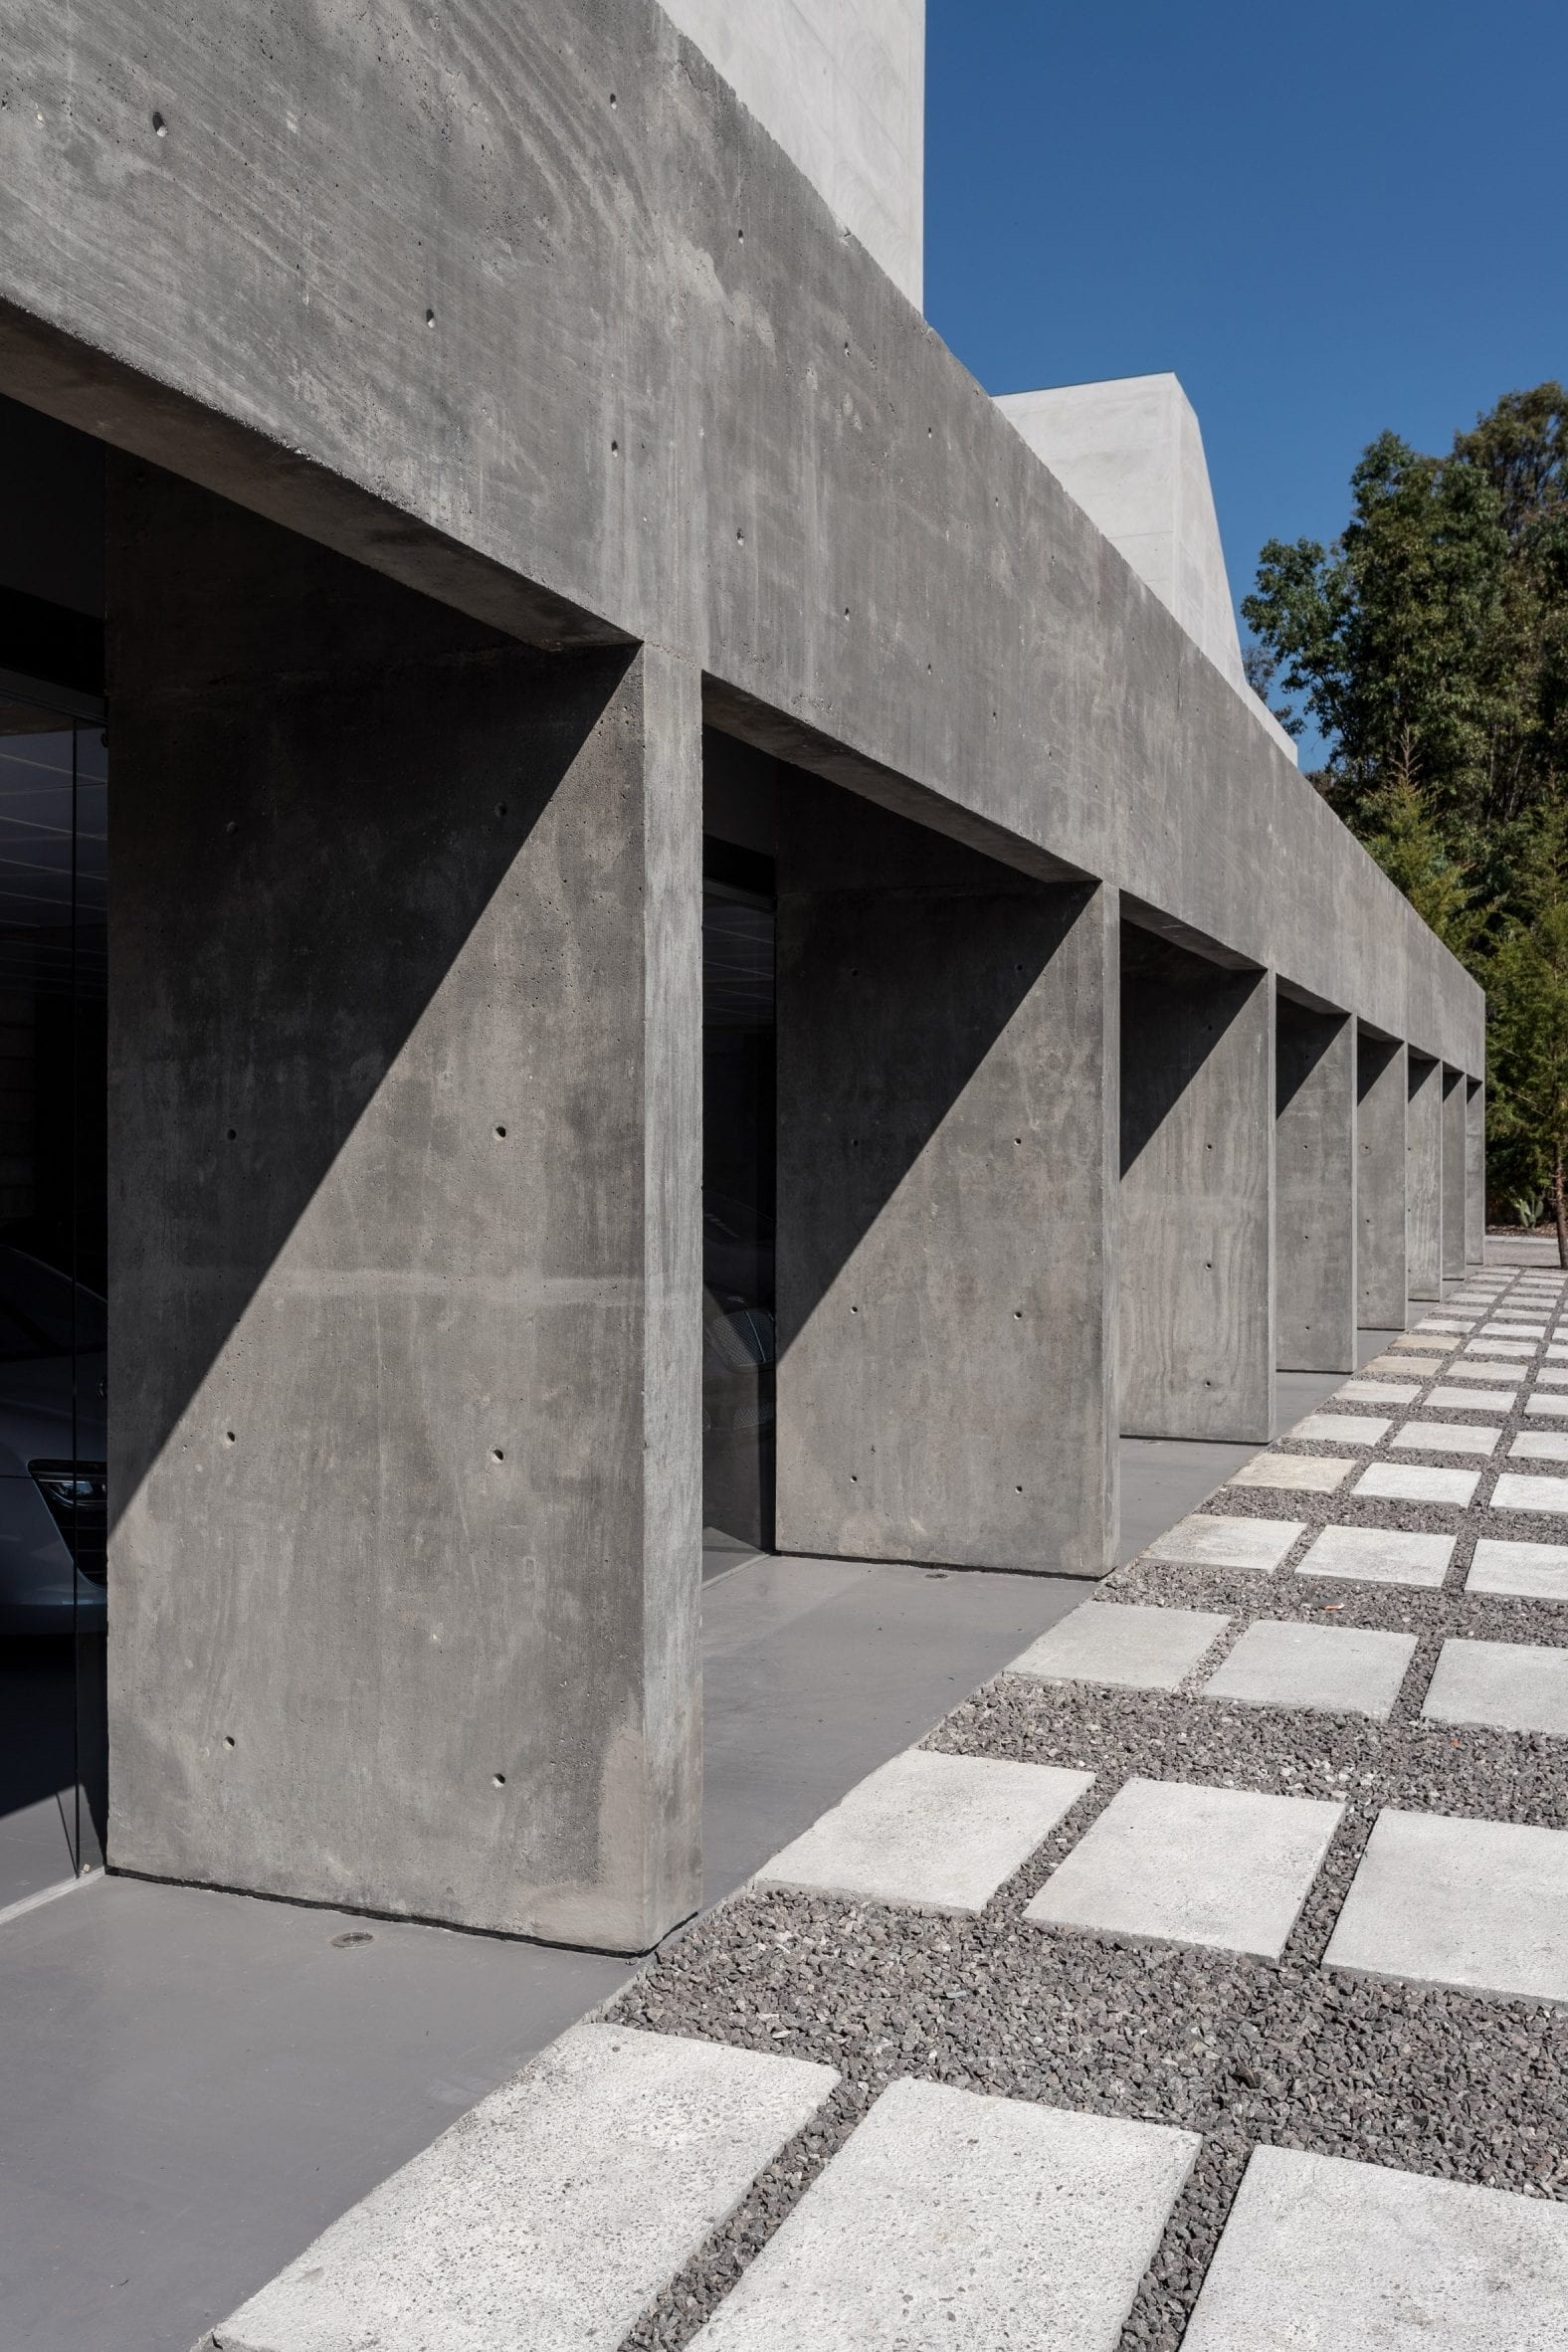 Concrete garage bays by Morari Arquitectura